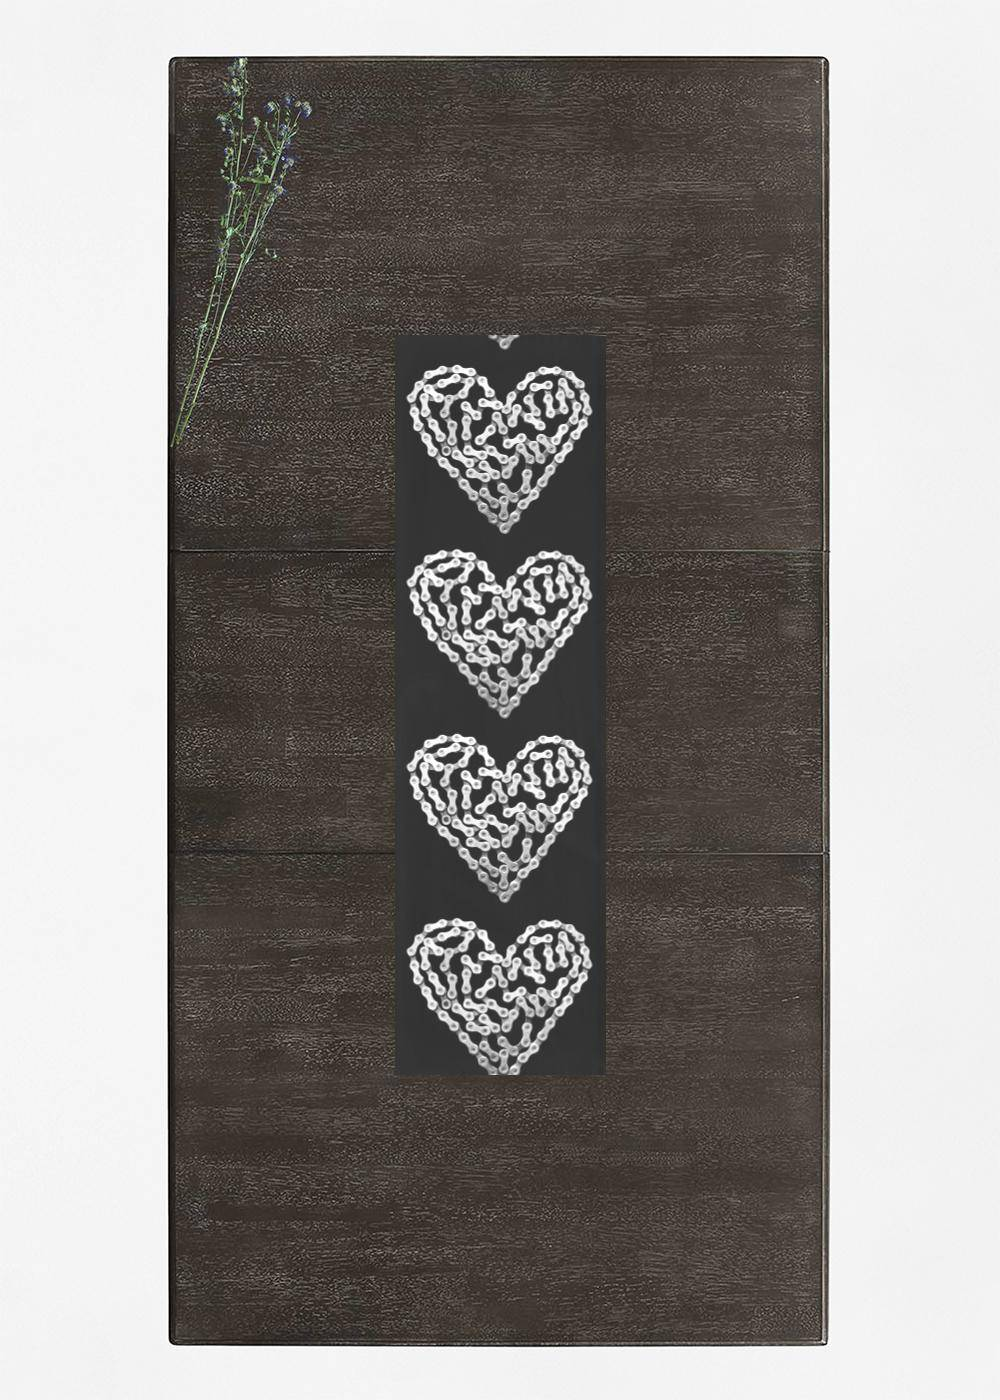 VIDA Table Runner - Bike Chain Heart by VIDA Original Artist  - Size: Short